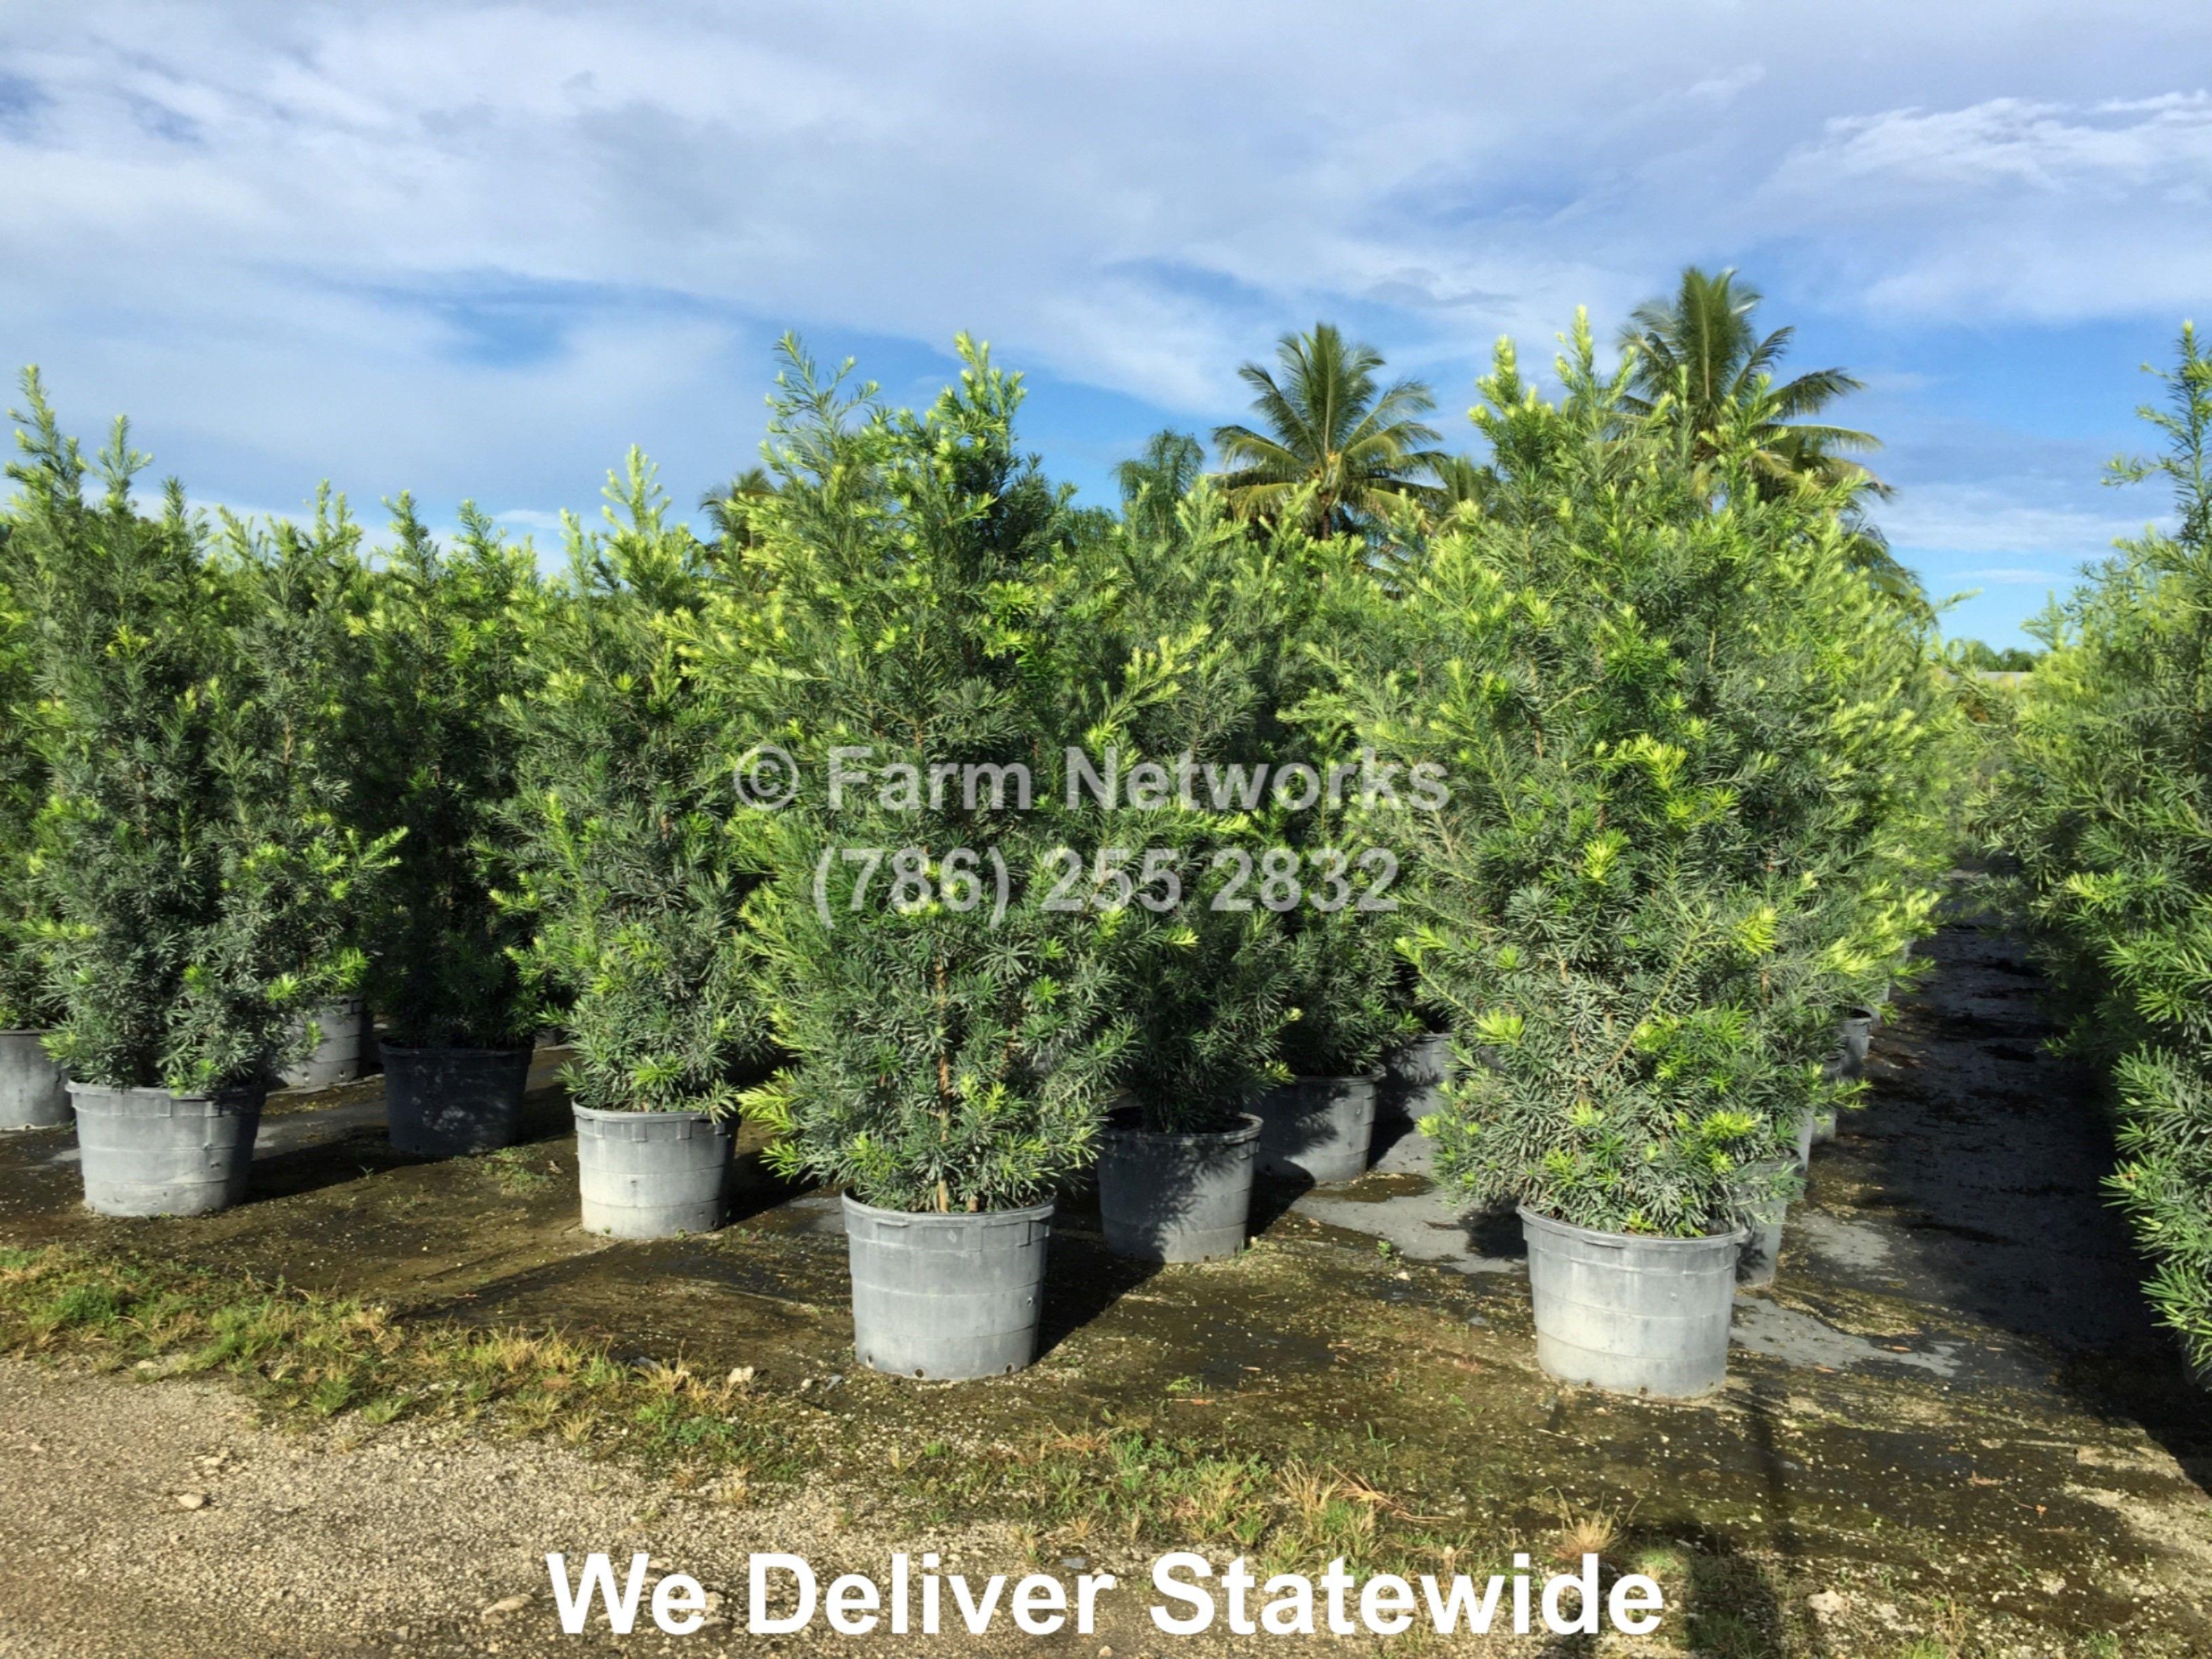 25 Gallon Podocarpus Hedge Broward Delray Beach Plant Nursery